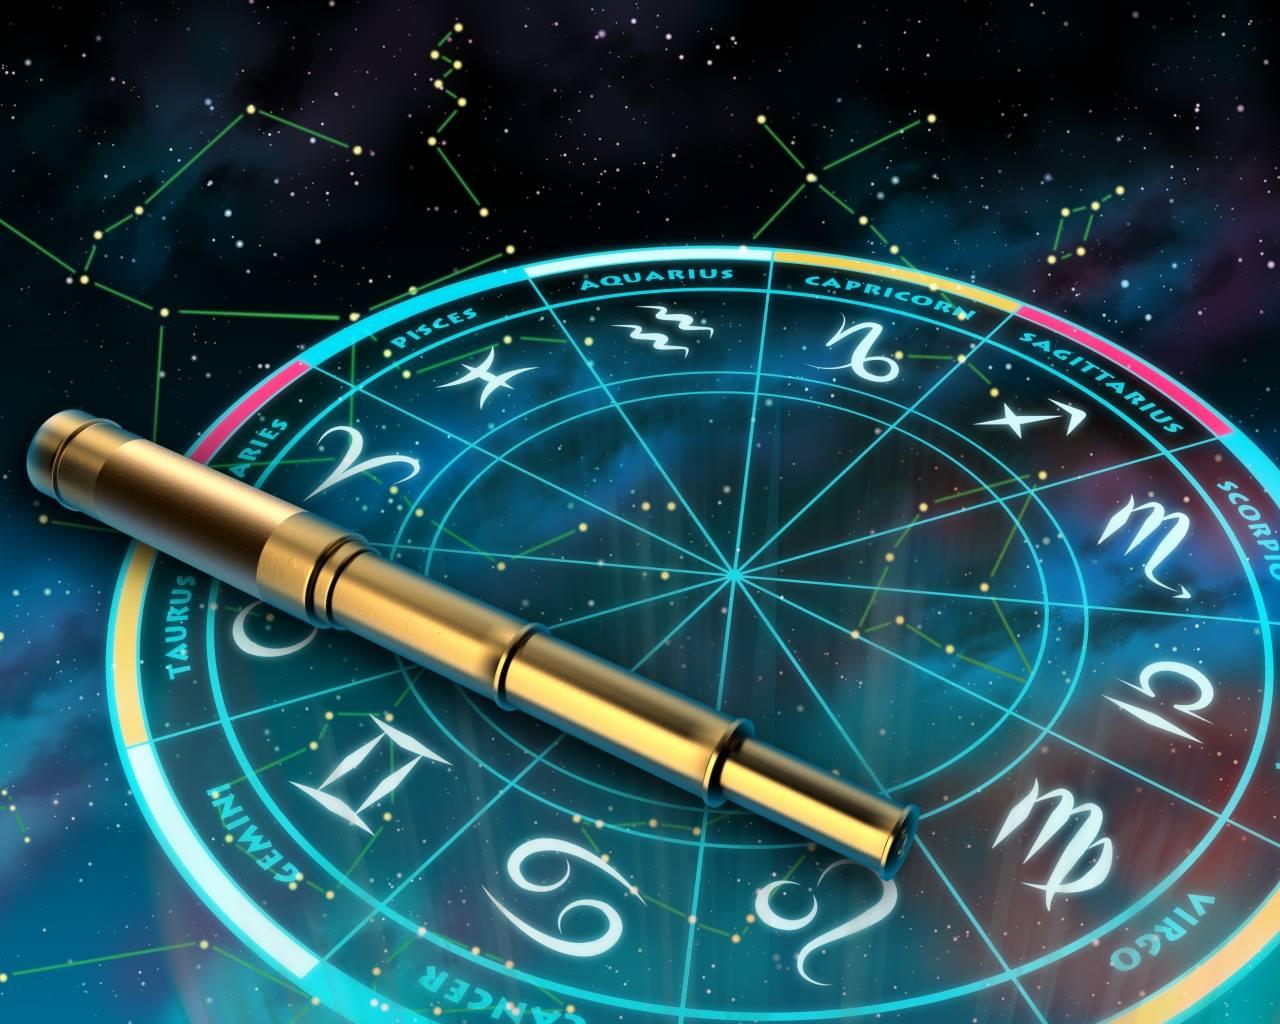 astrologywheel.jpg